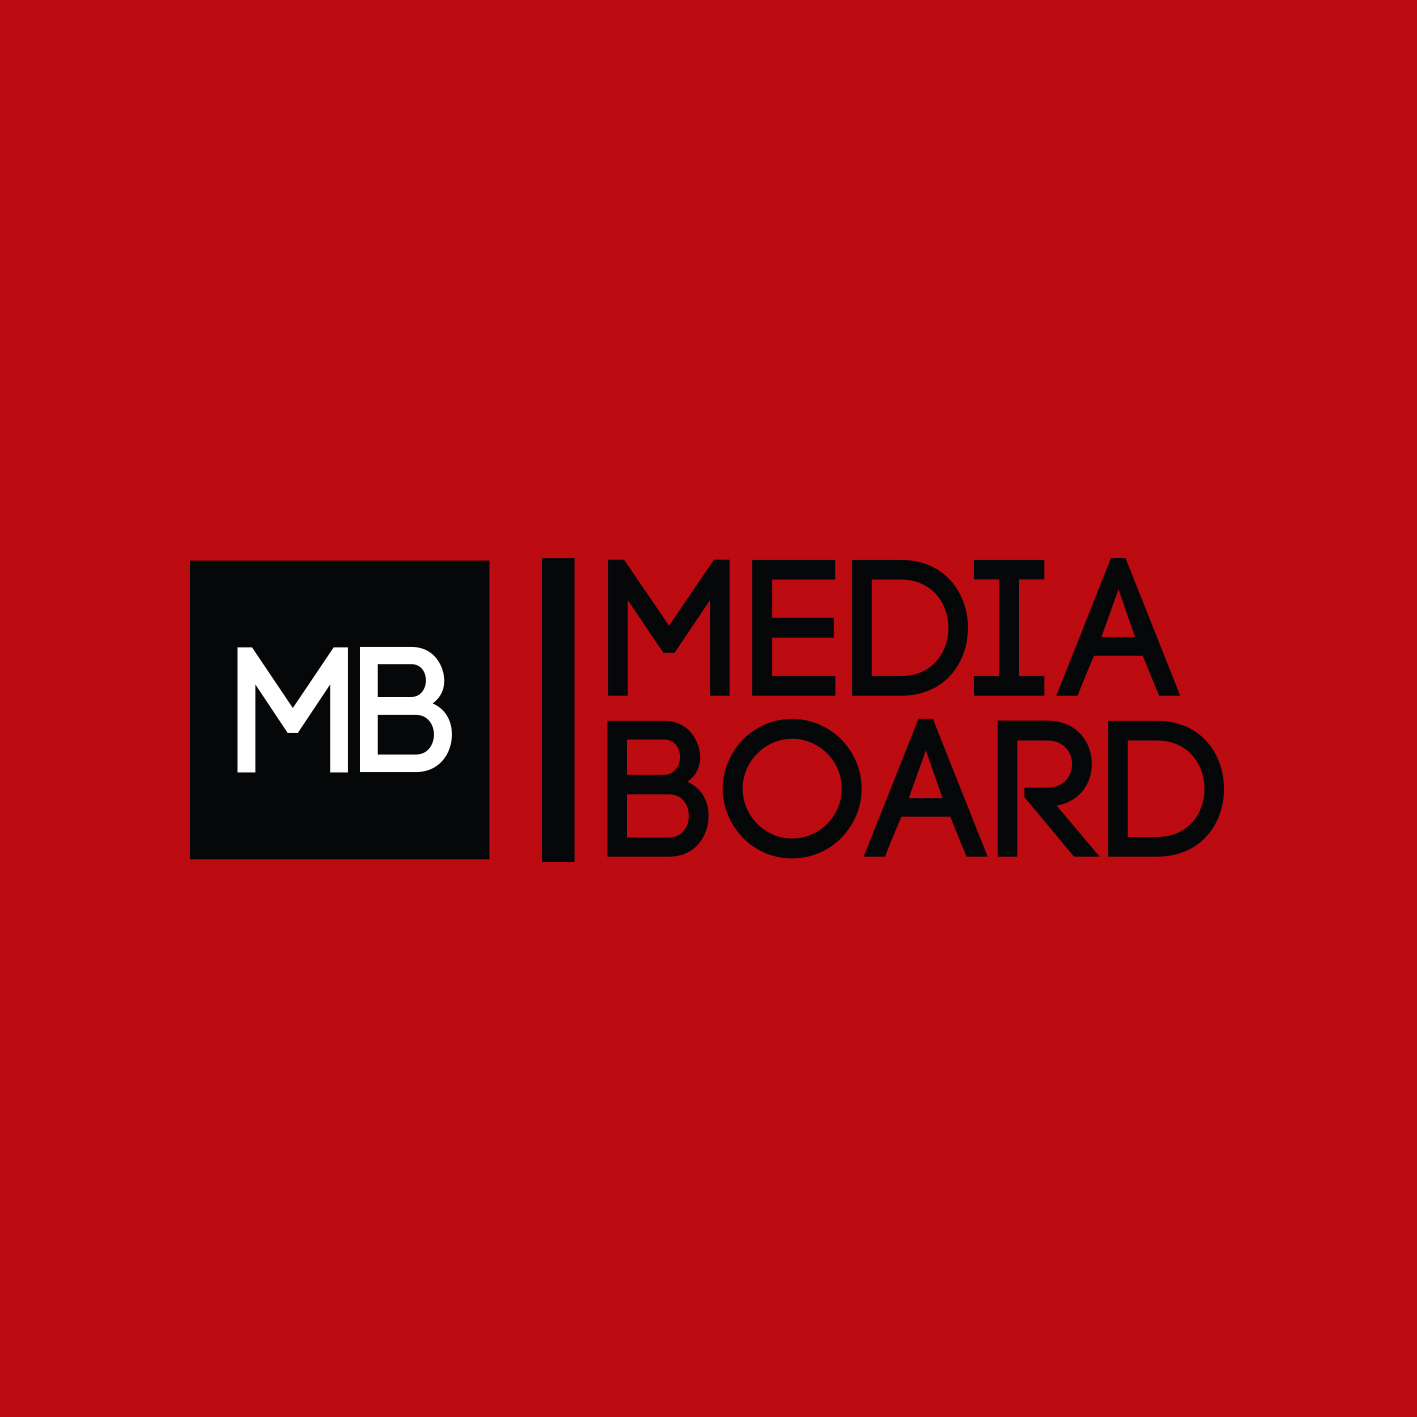 Who Are Media Board International?